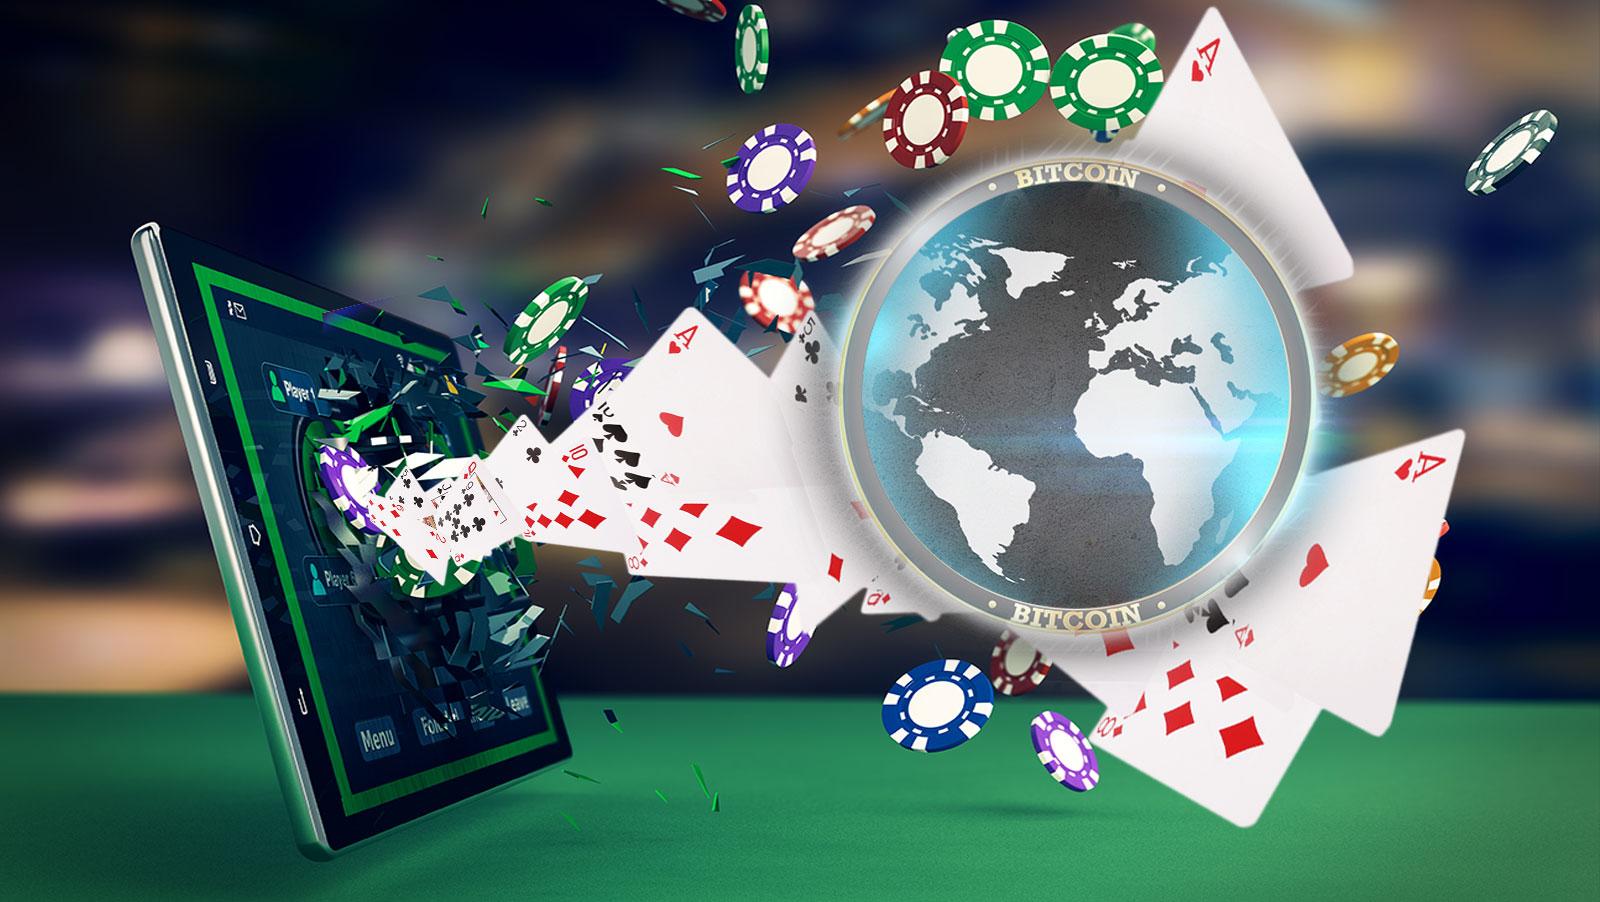 Ketahui Perbedaan Antara Poker qq & Video Poker